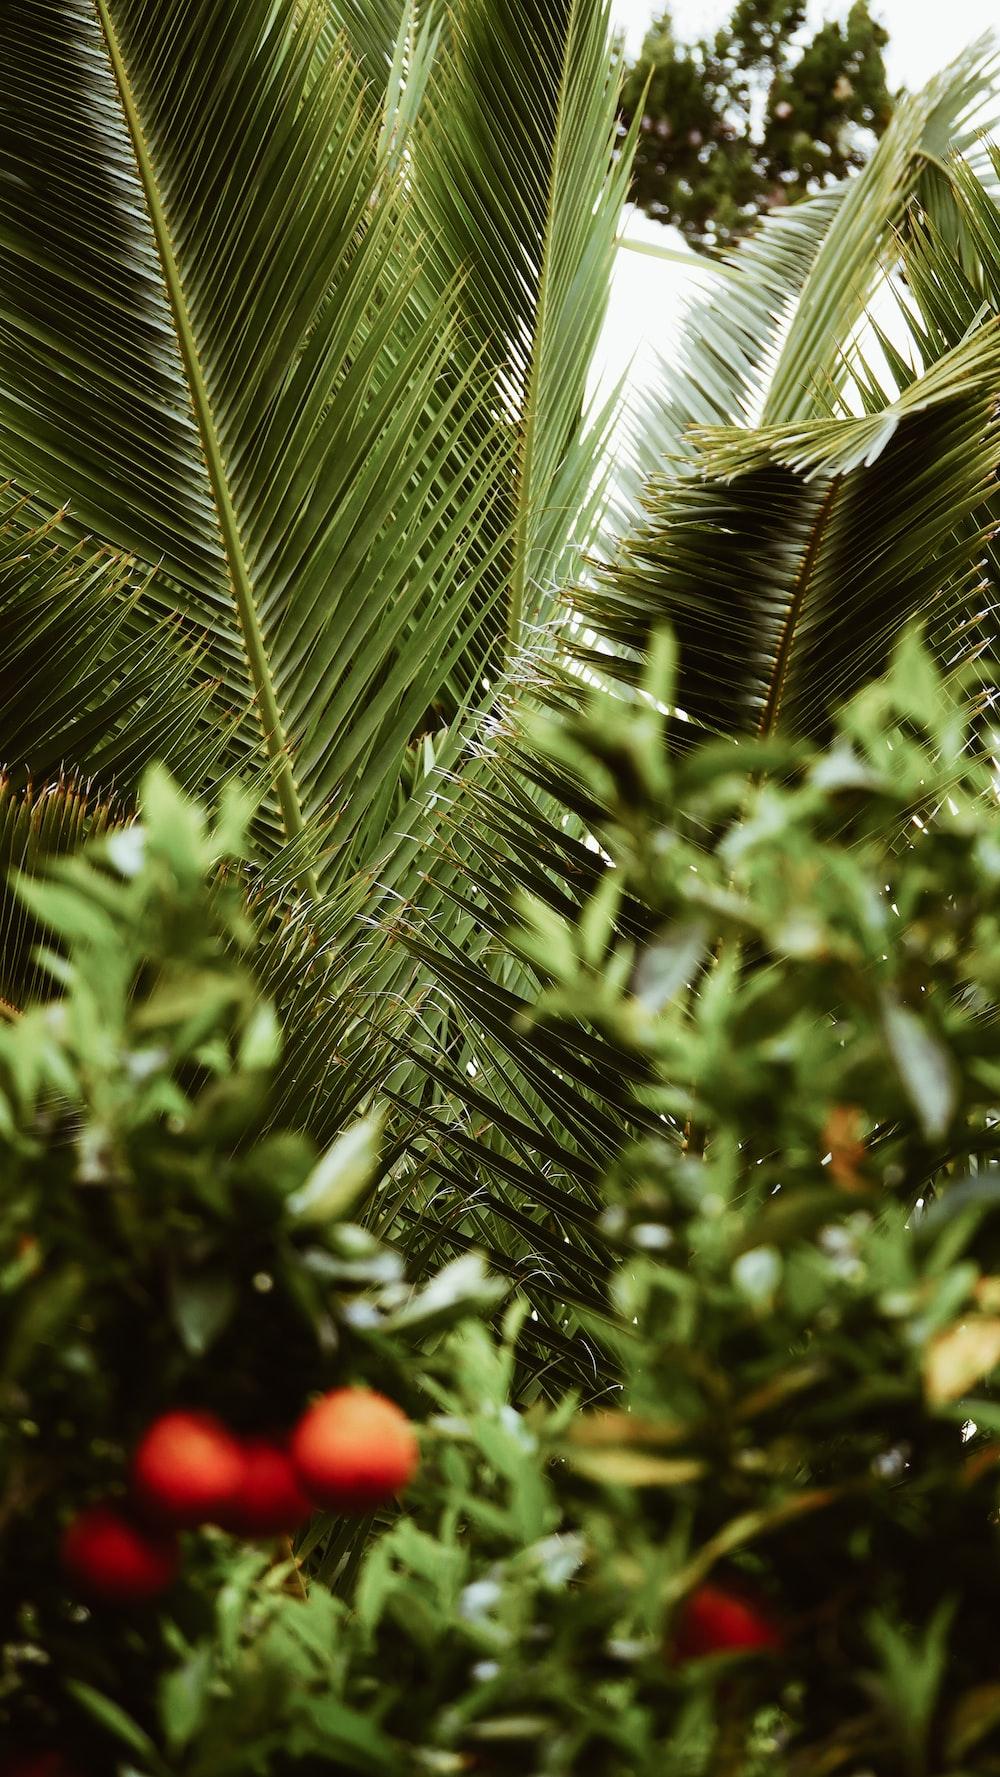 green coconut tree near green leaf plants